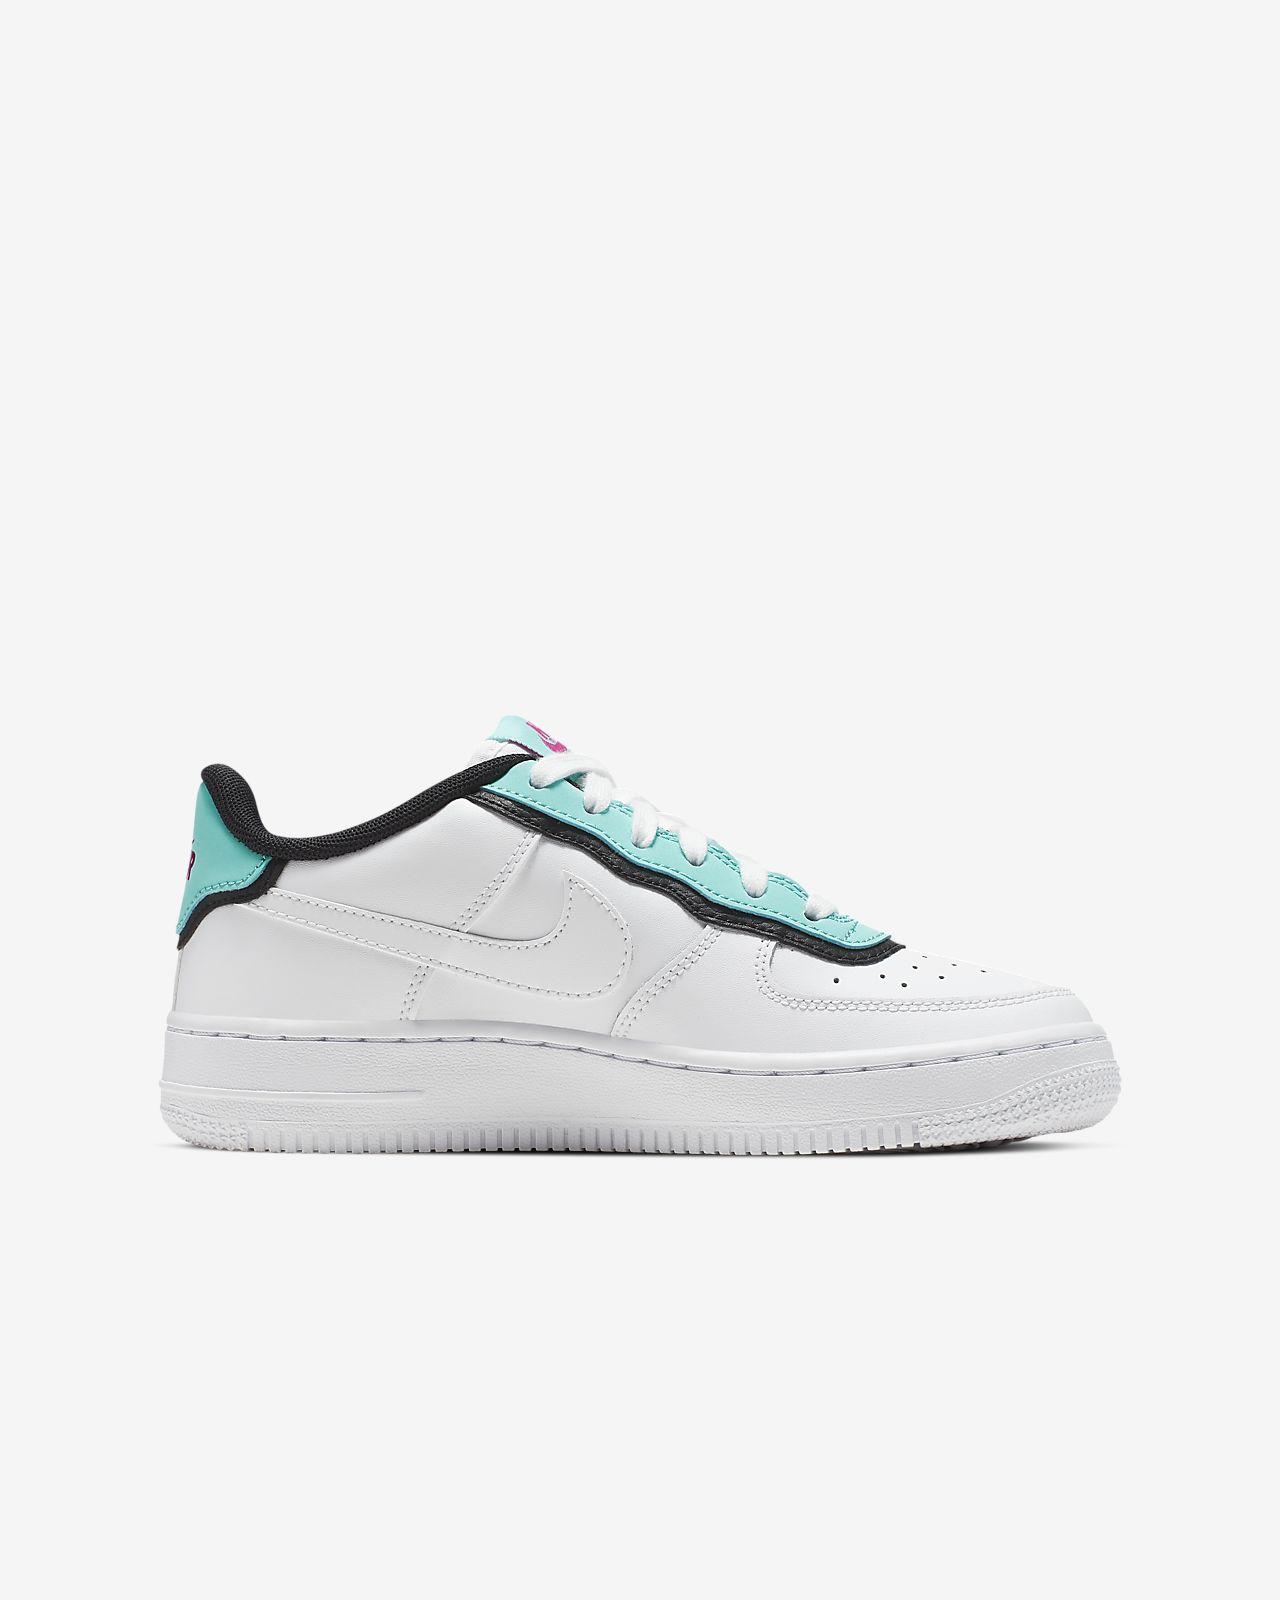 6e033eae Nike Air Force 1 LV8 1 DBL Older Kids' Shoe